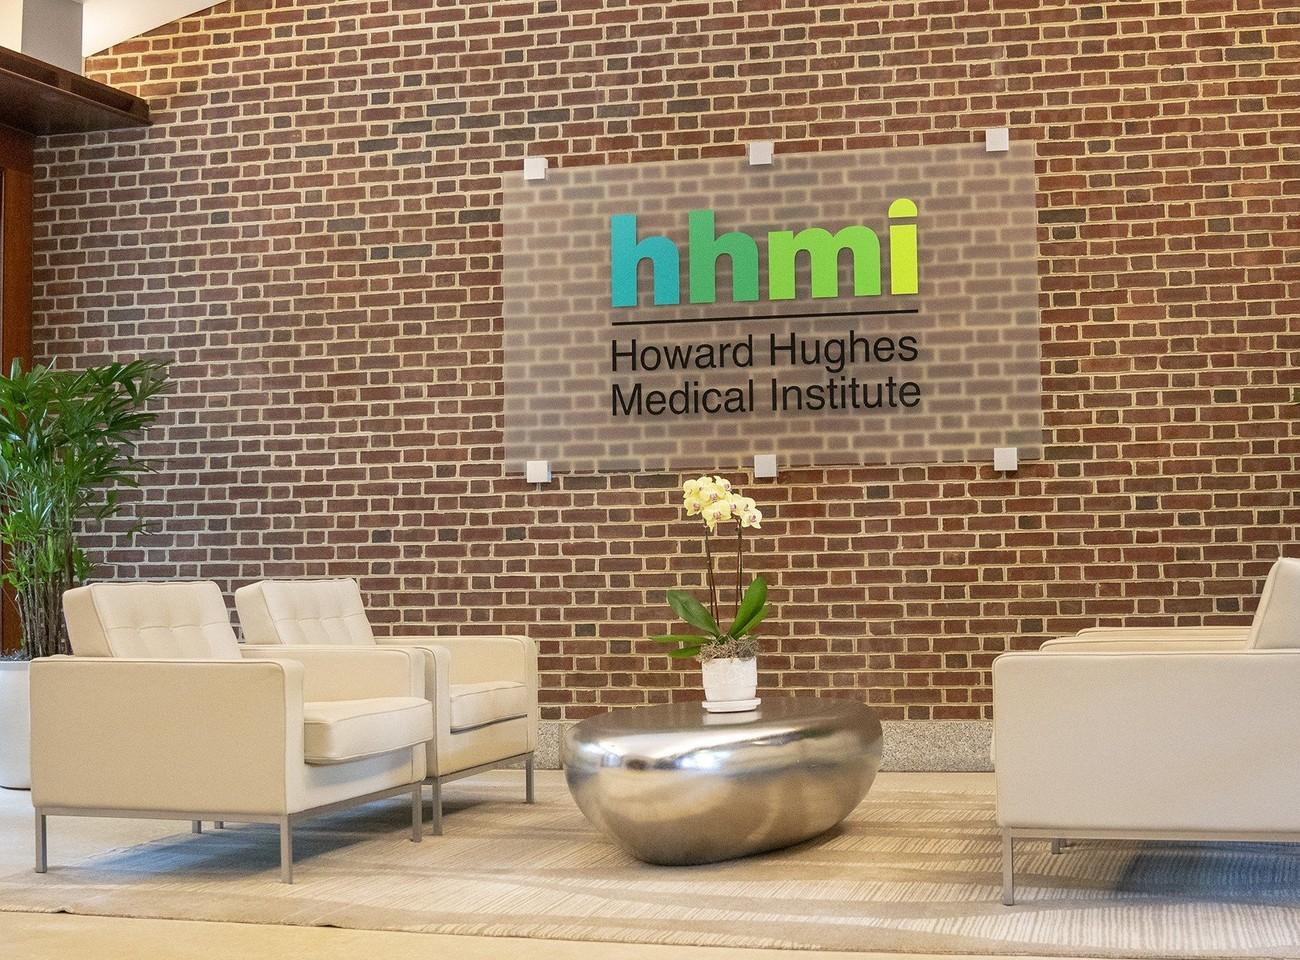 Howard Hughes Medical Institute Careers